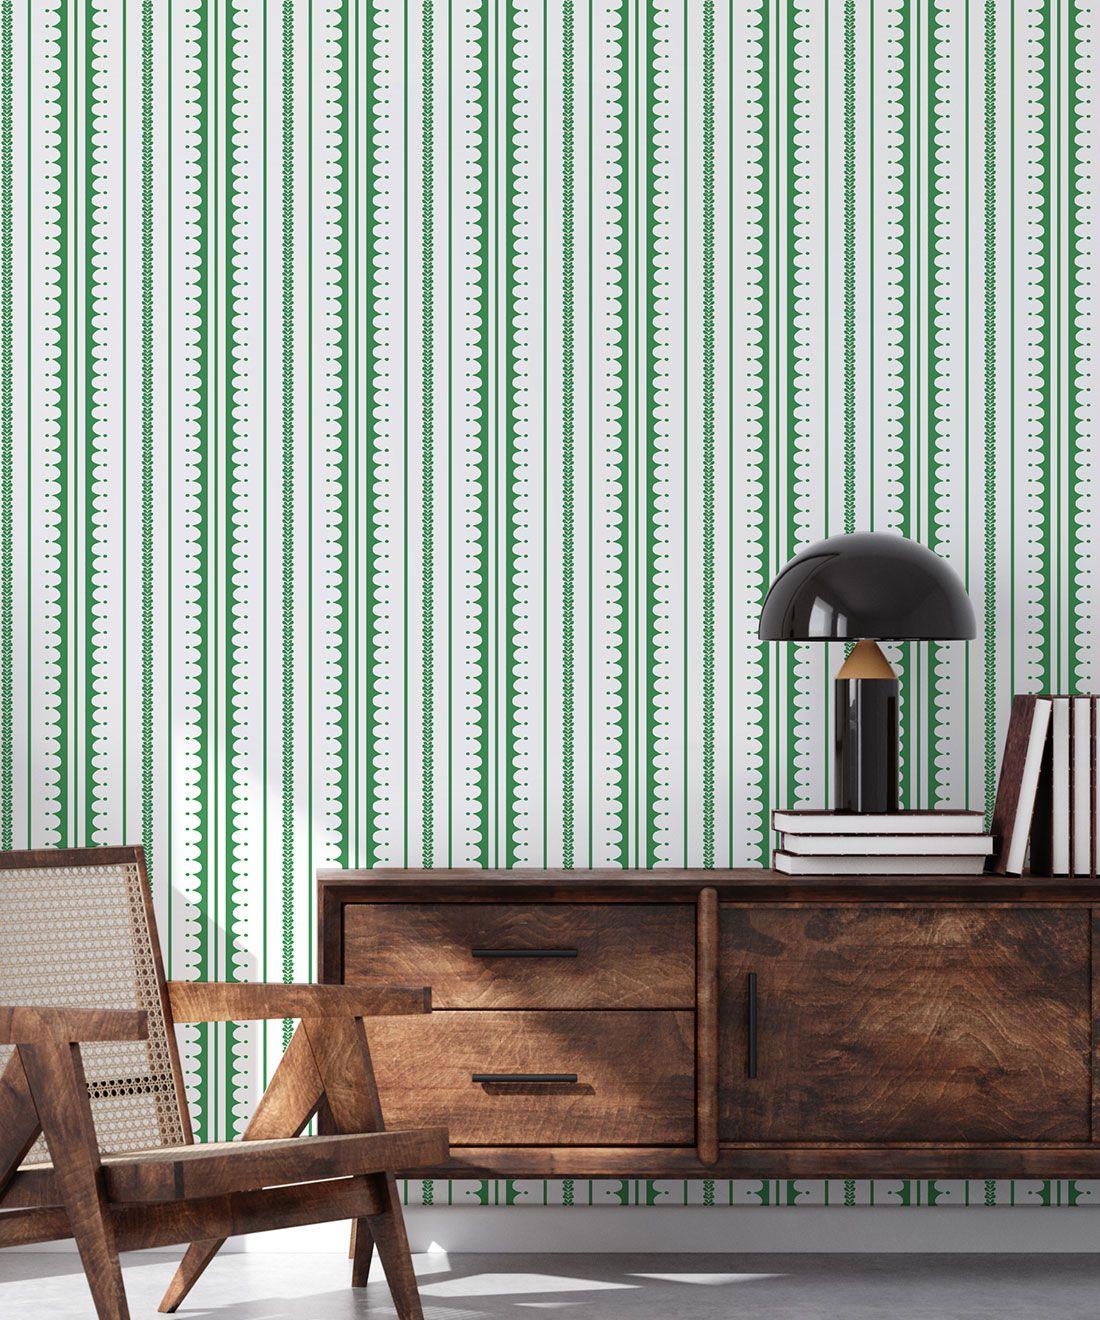 La Grand Coquille • Stripe and Scallop Wallpaper • Forest Green • Insitu